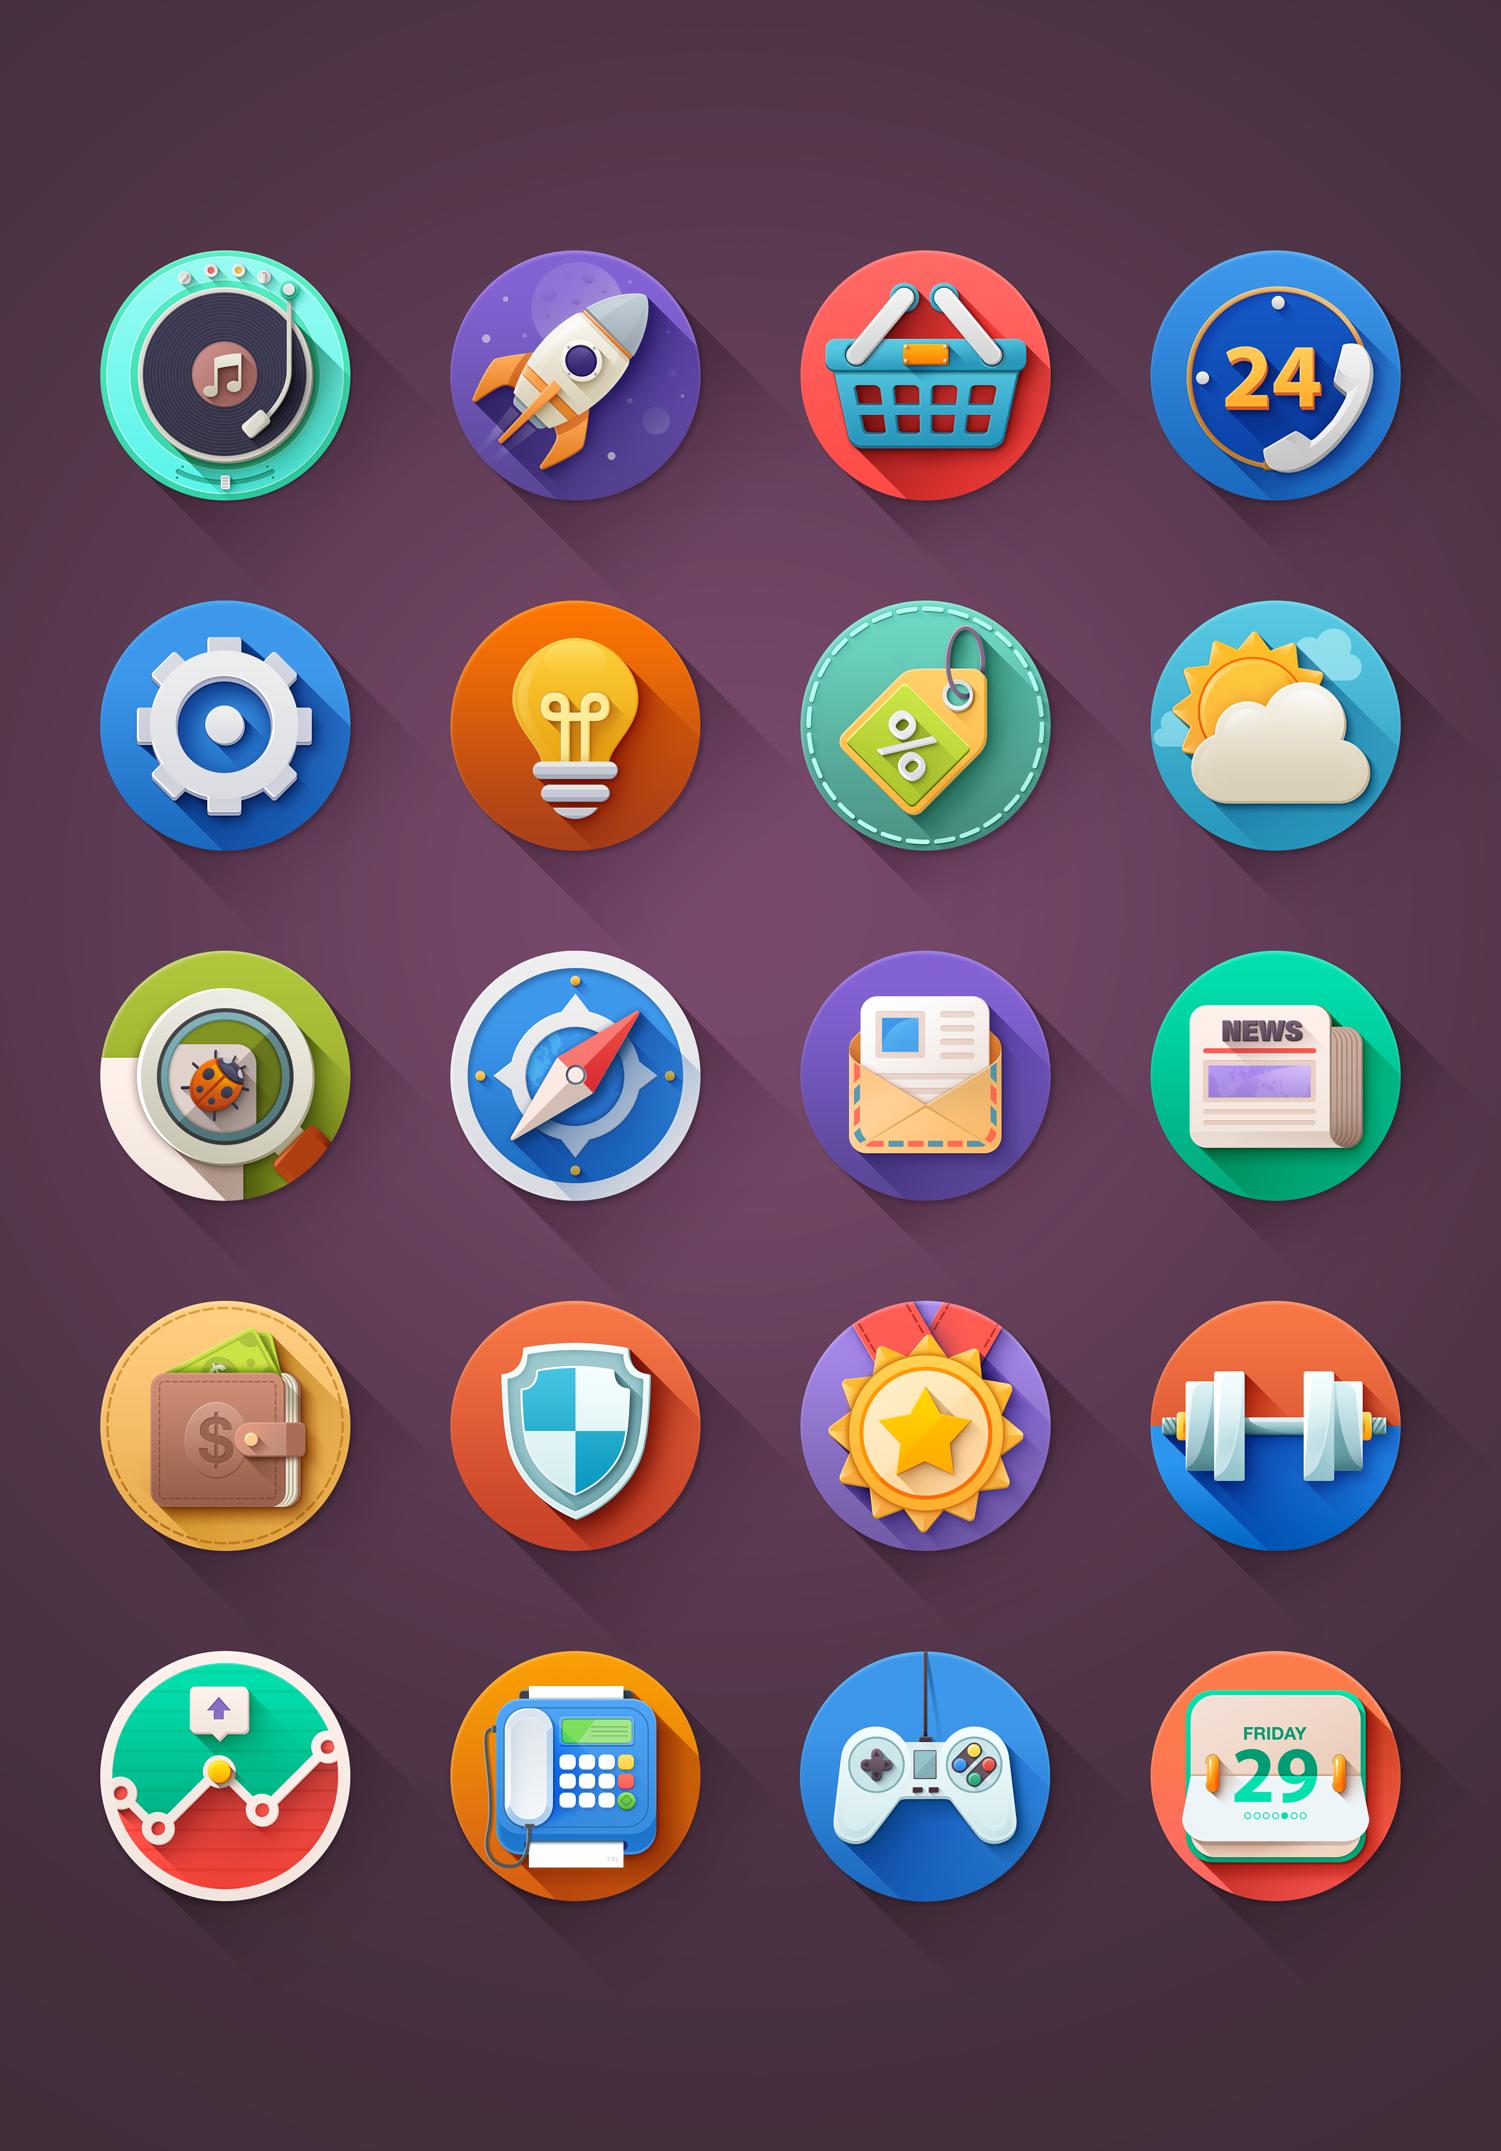 Awesome Icons!!! #icons #flatdesign | Design // Icons | Pinterest ...